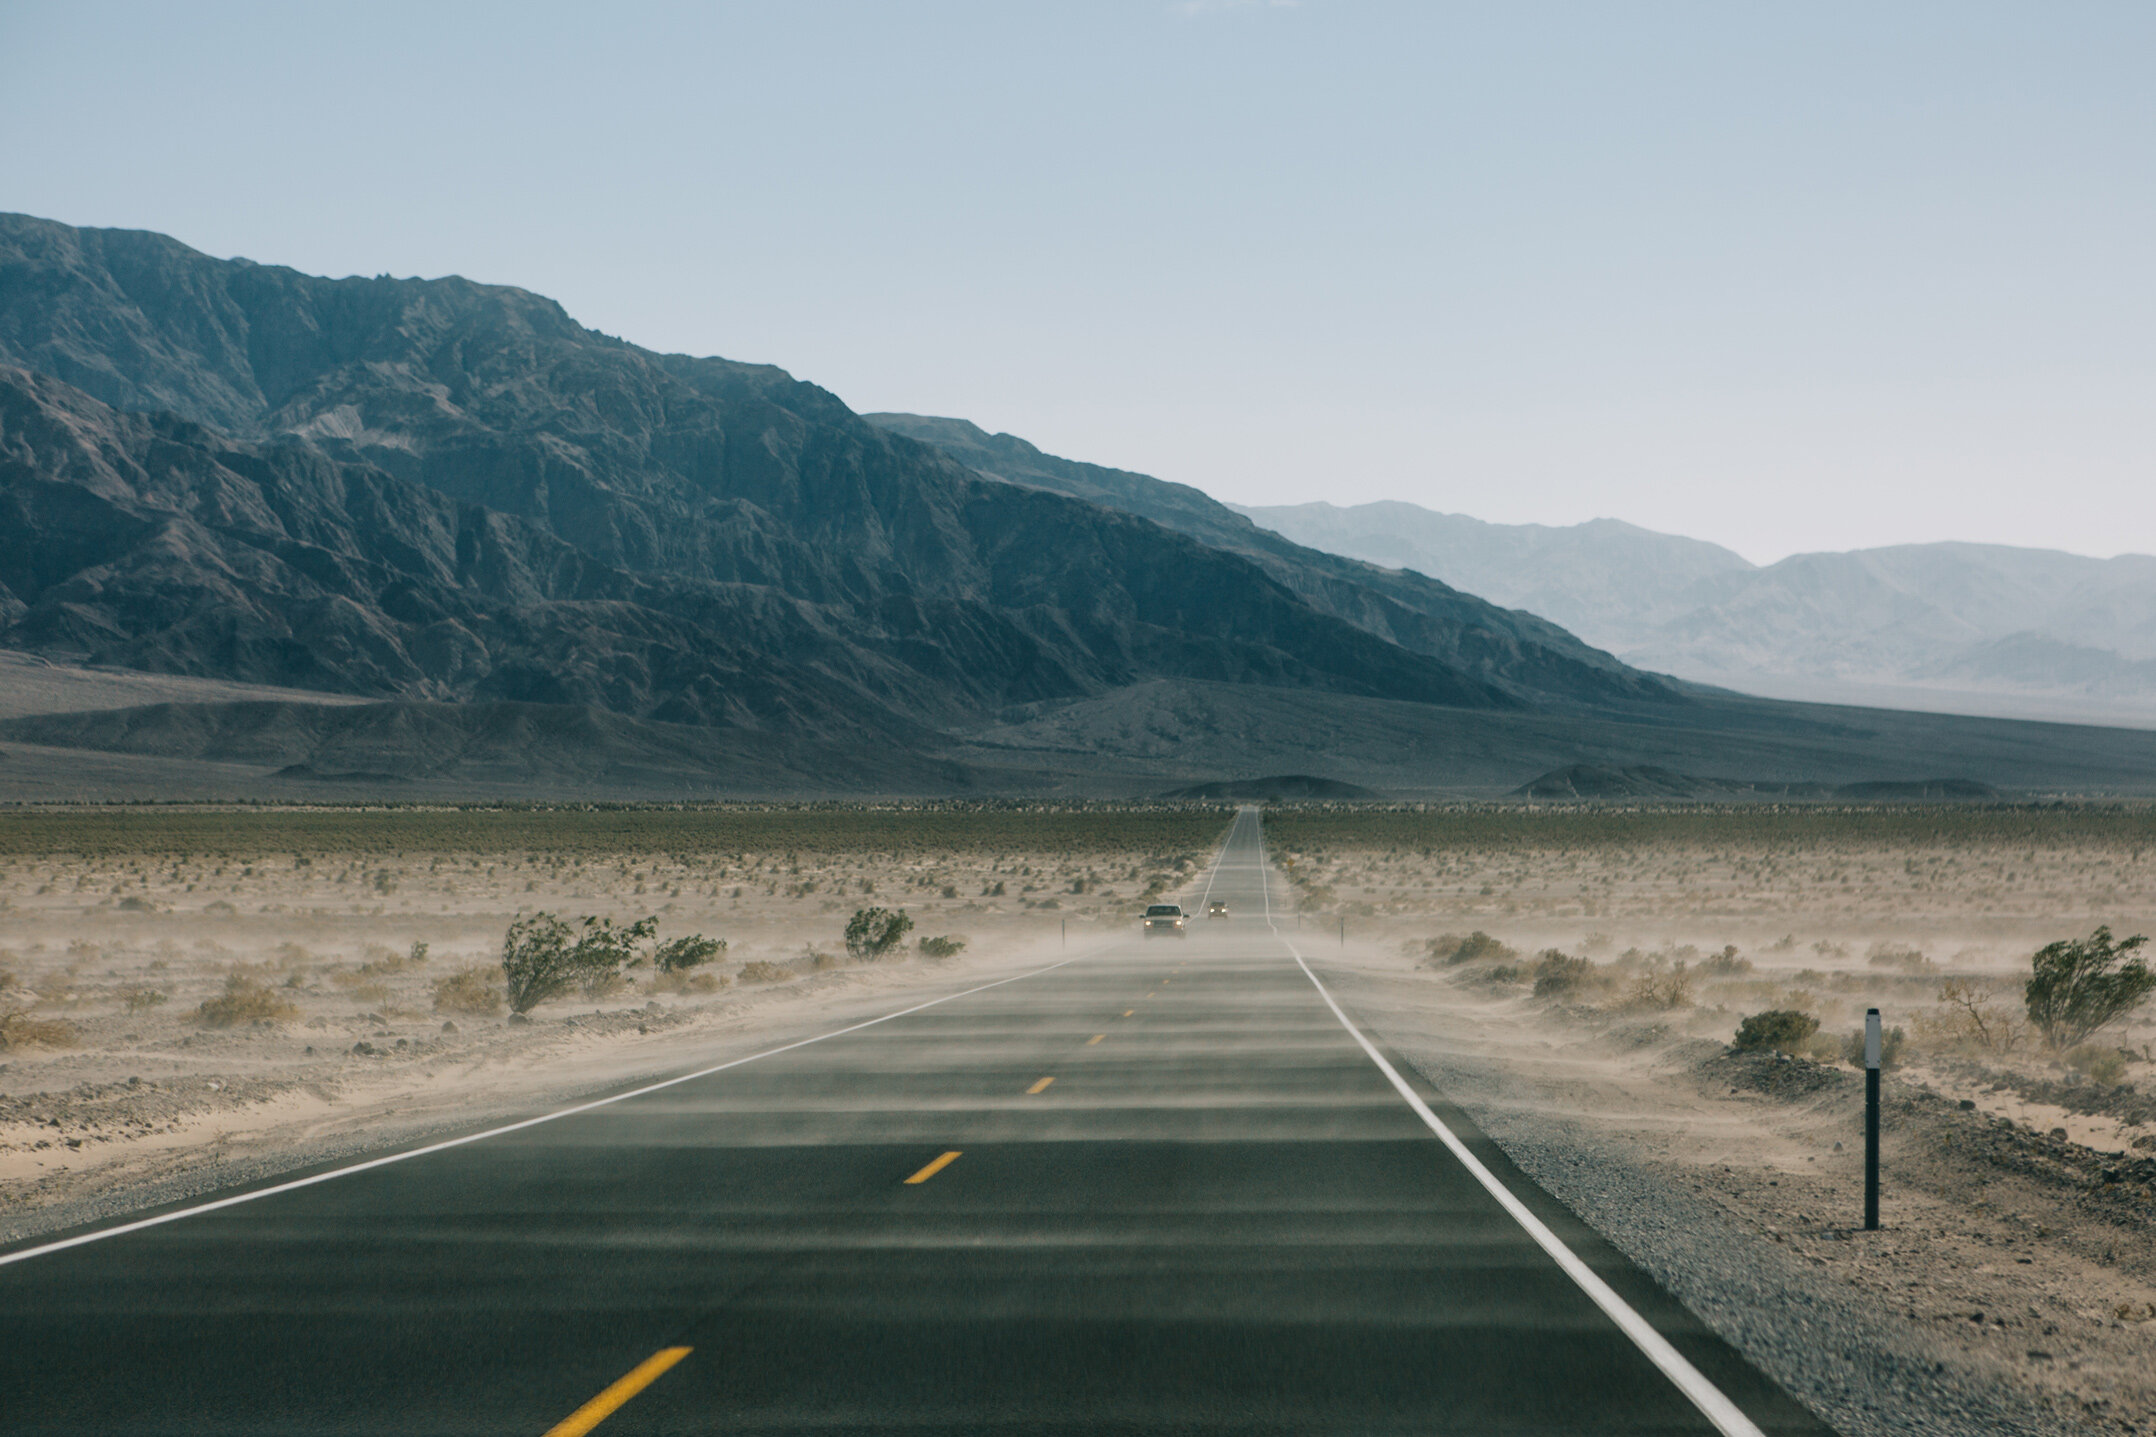 CindyGiovagnoli_Road_Trip_Travel_National_Parks_Explore_America-014.jpg